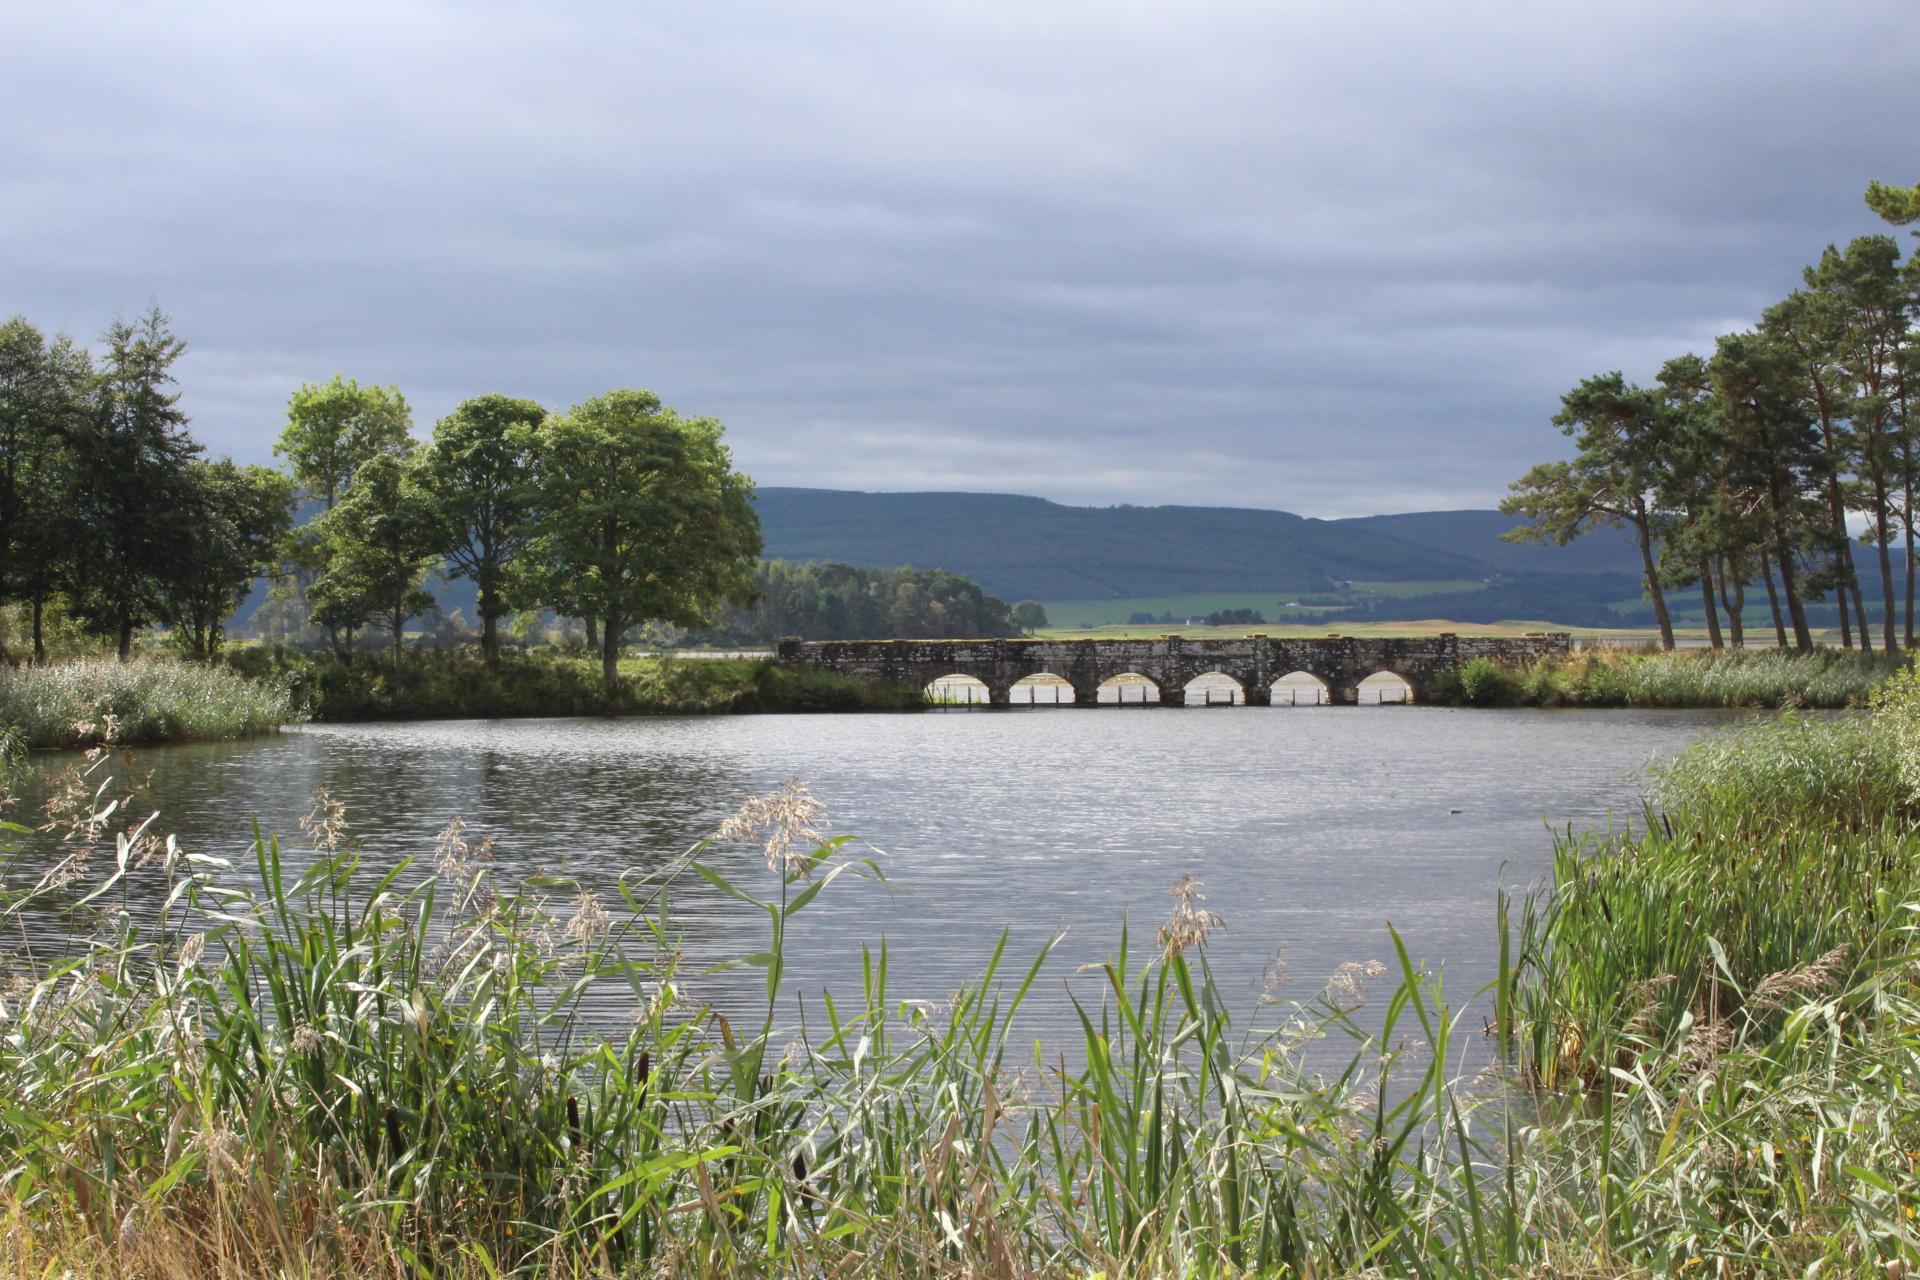 Fishing on the lochs